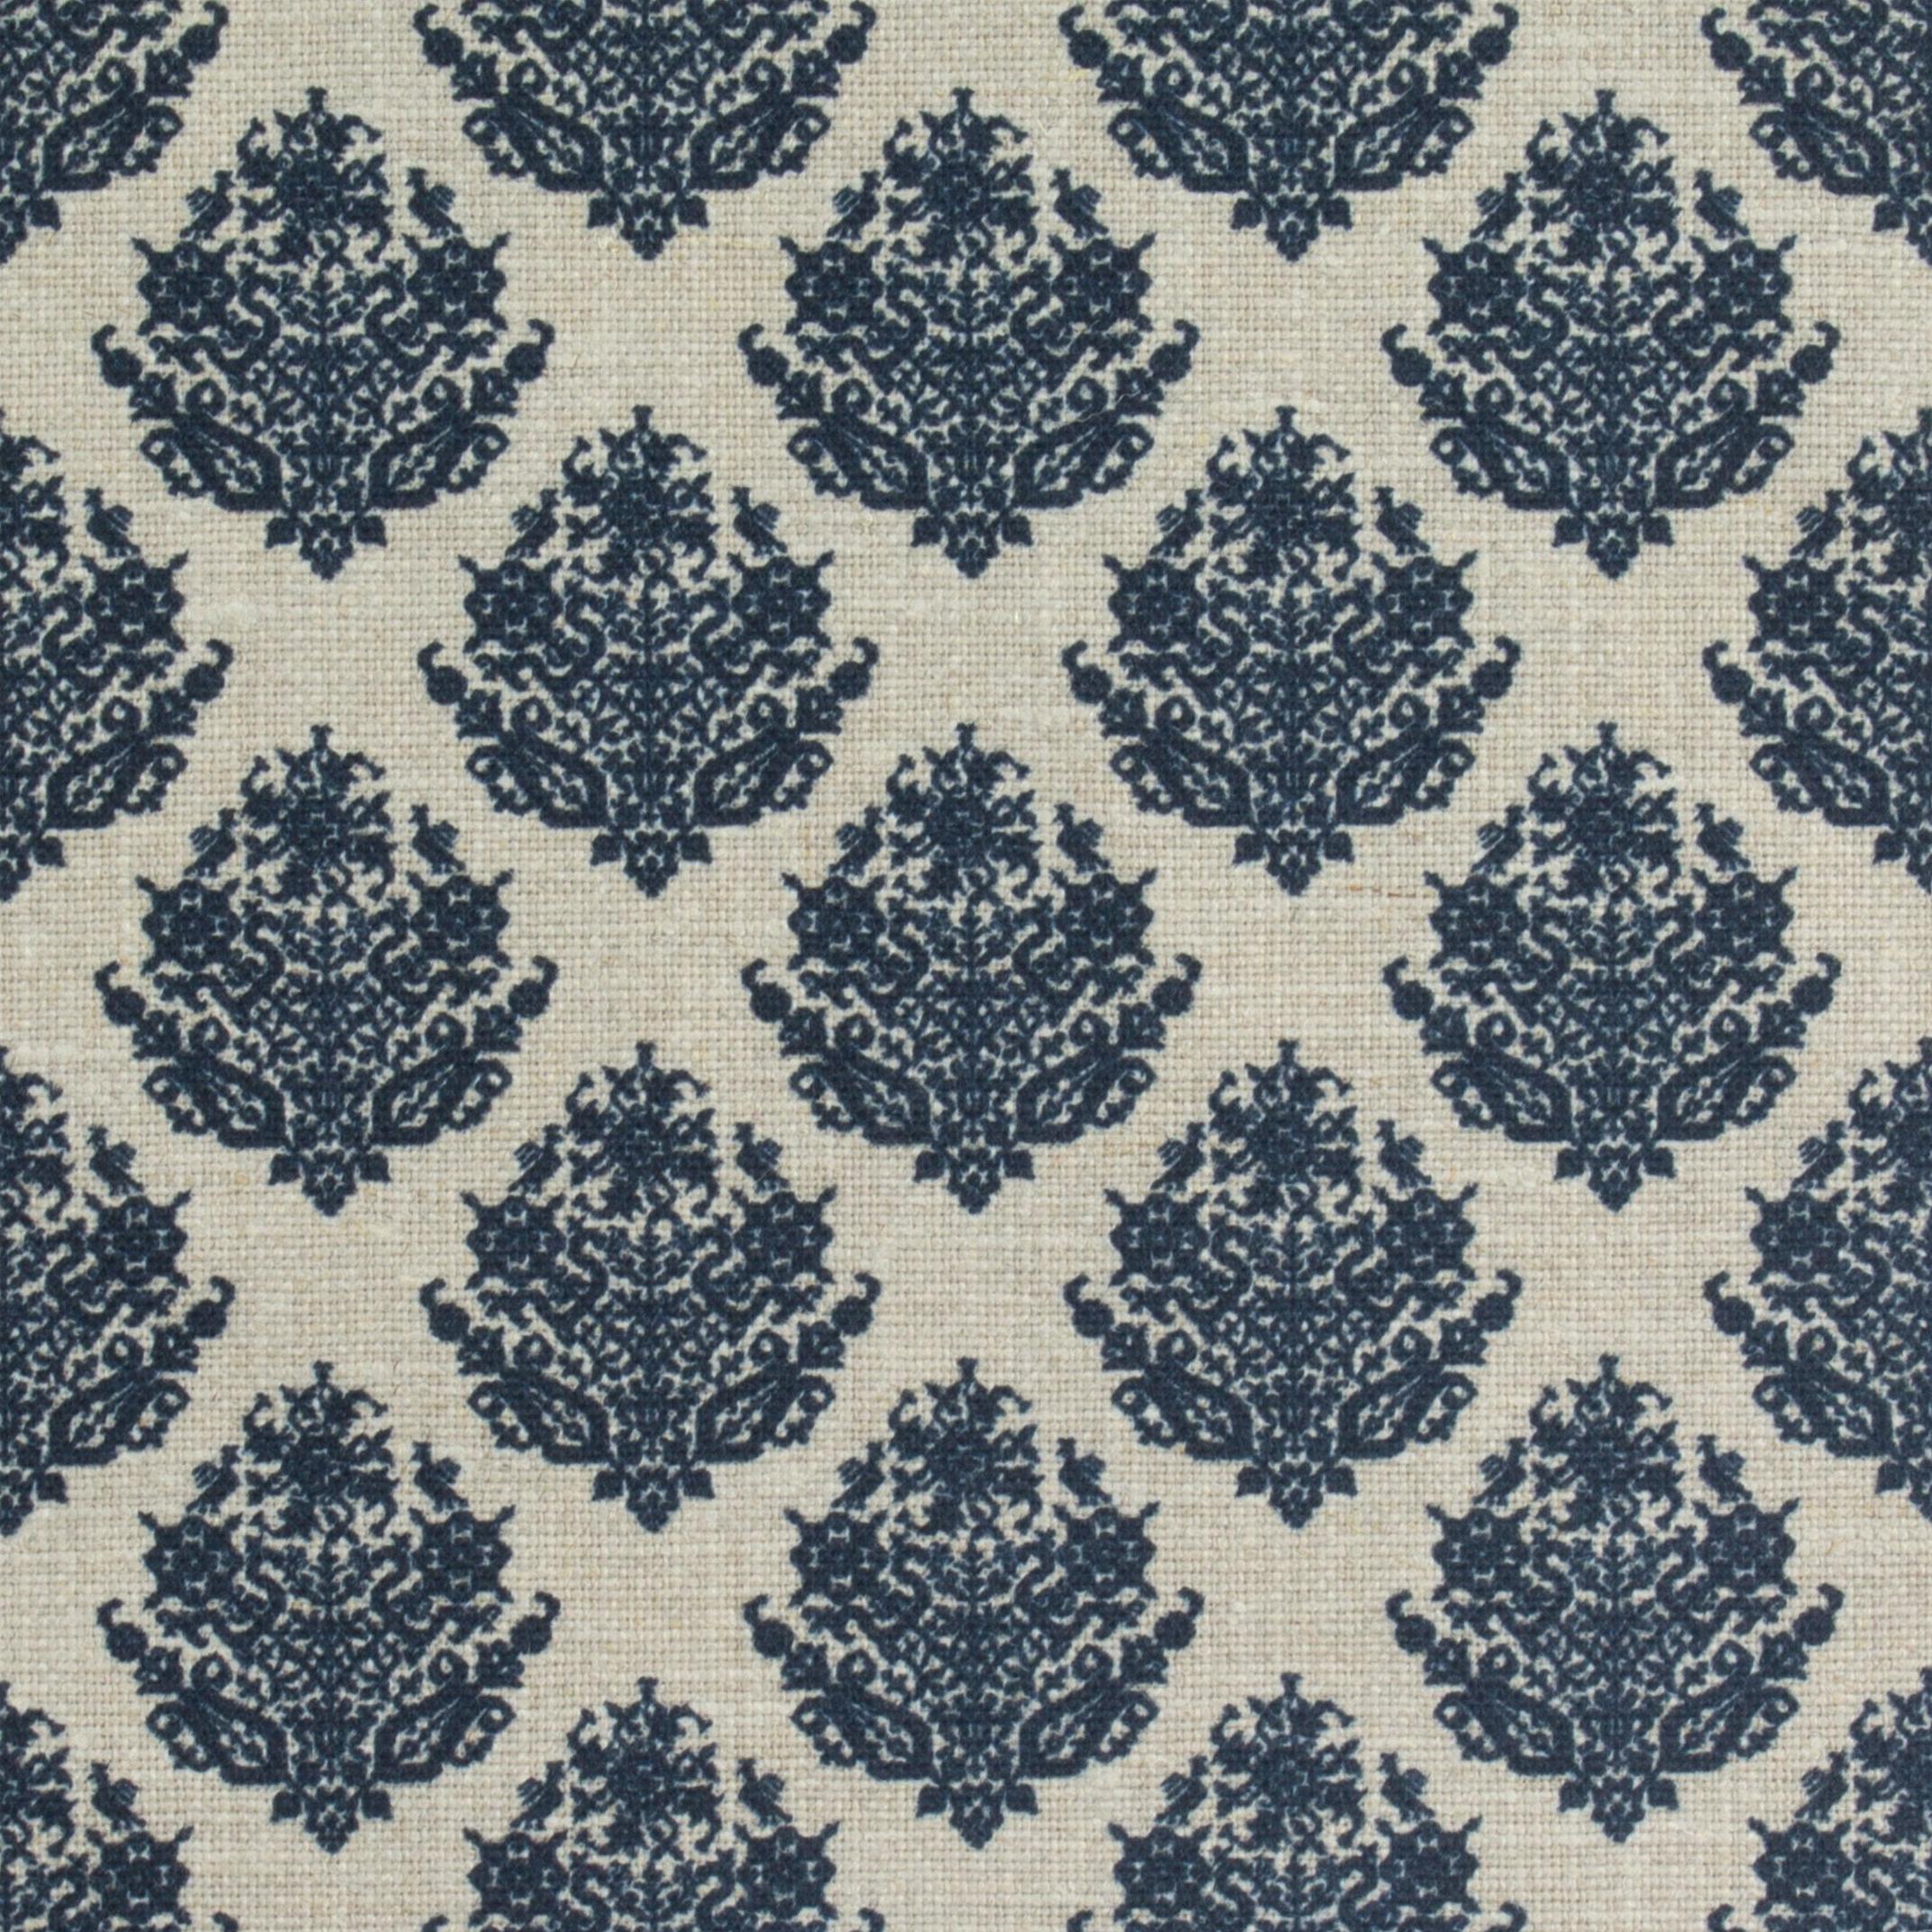 Textile_navy_ivory.jpg